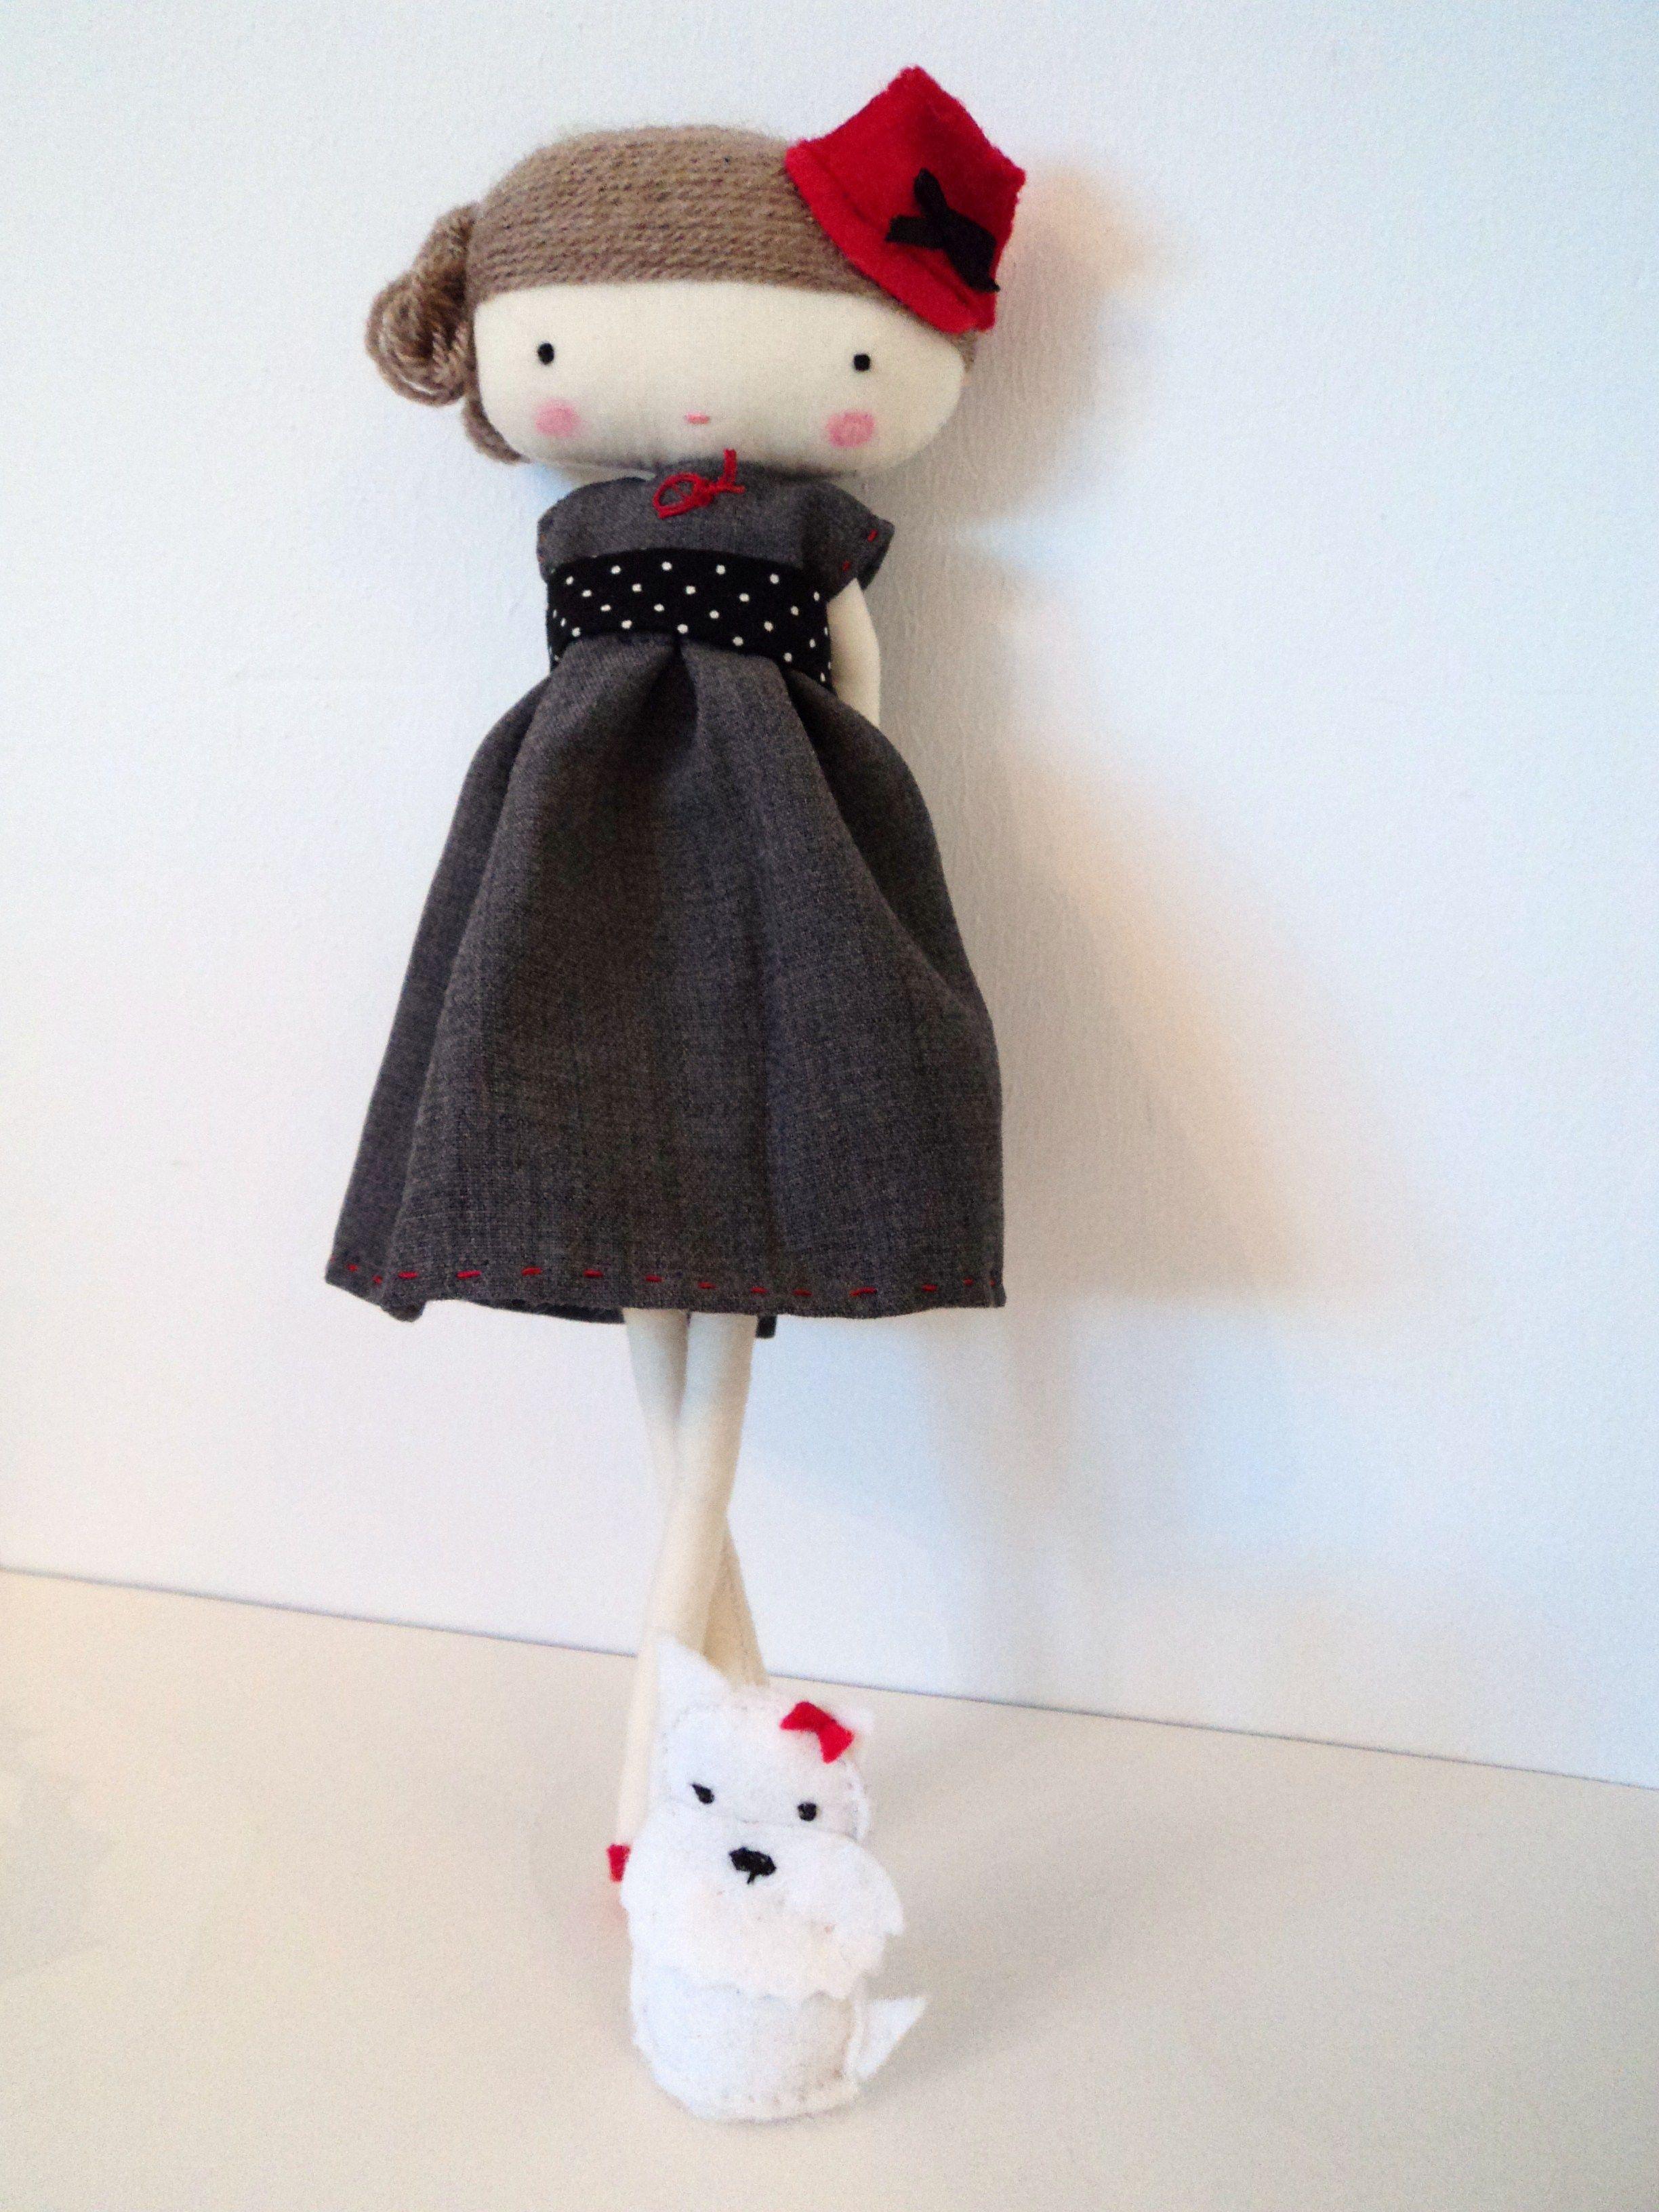 Muñecas adorables | Dolls, Softies and Craft